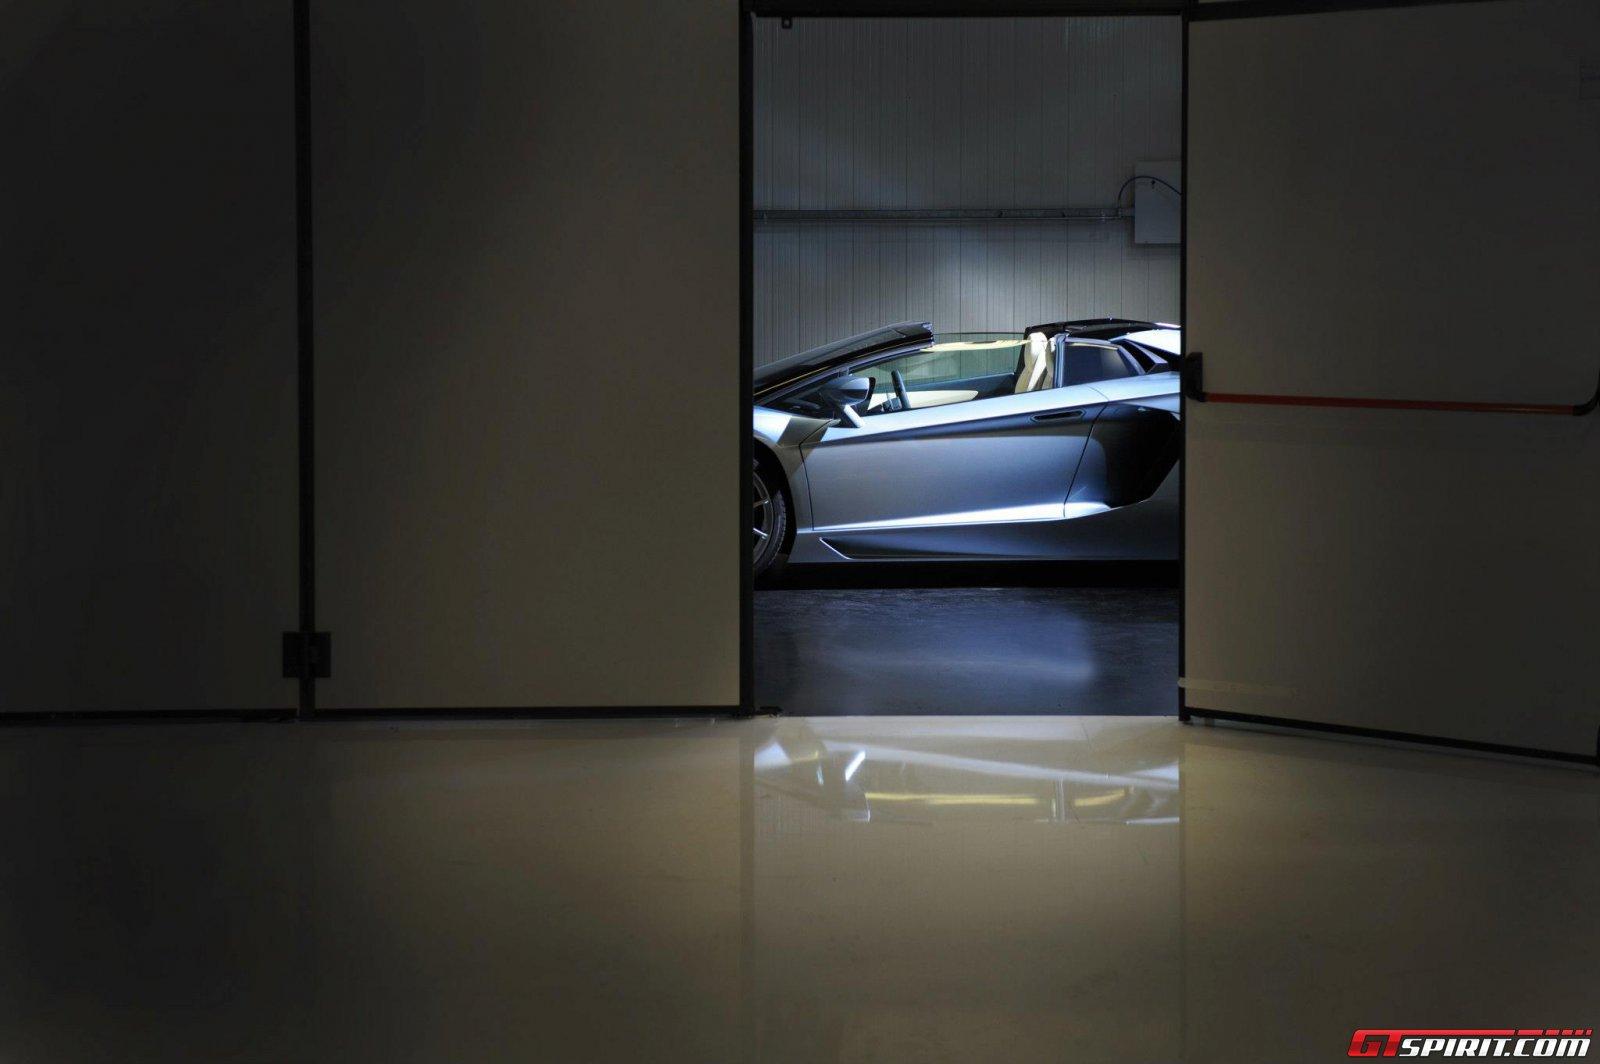 2013 Lamborghini Aventador LP700-4 Roadster Photo 17